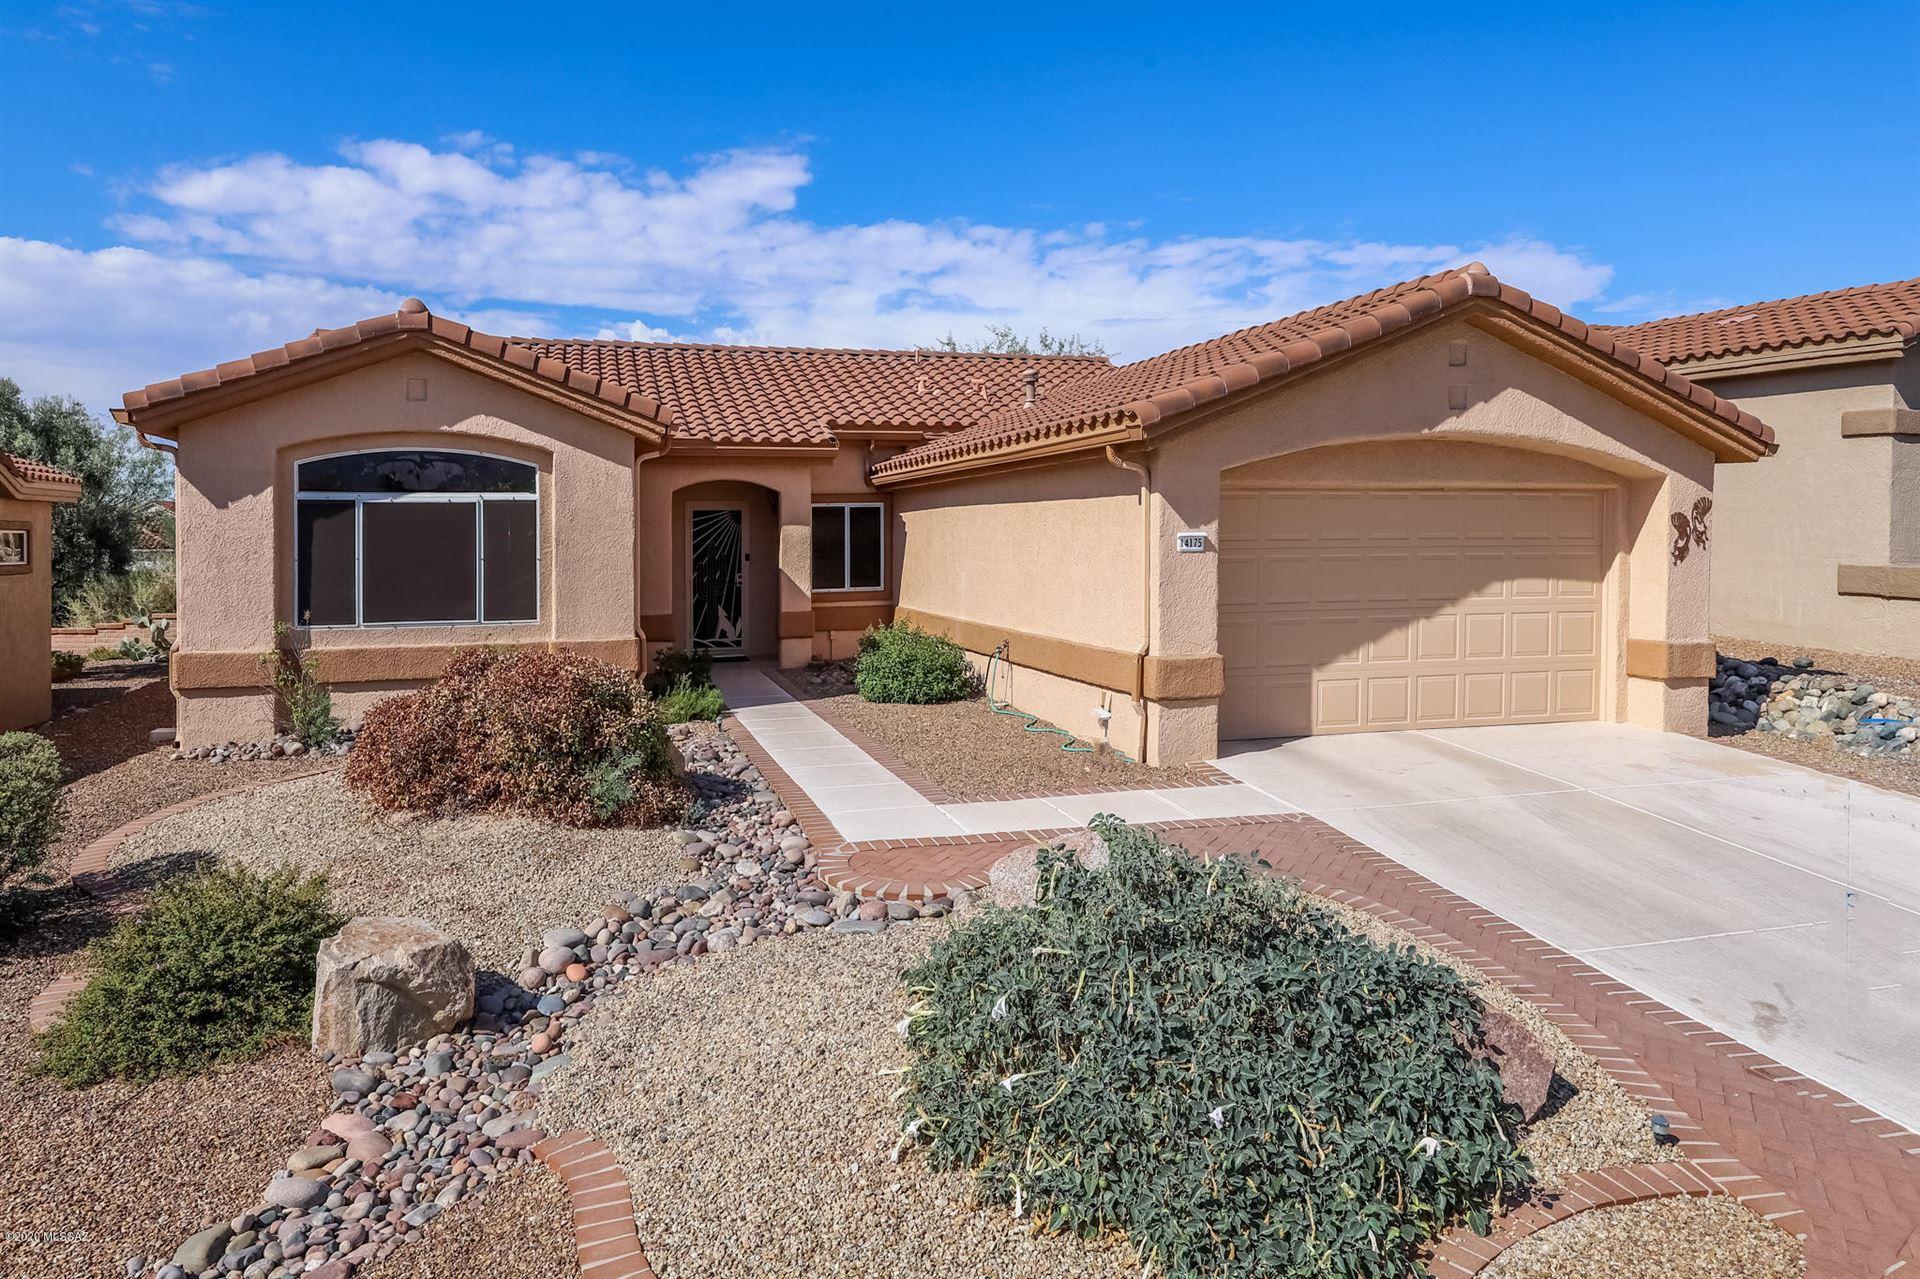 14175 N Buckingham Drive, Oro Valley, AZ 85755 - #: 22027627